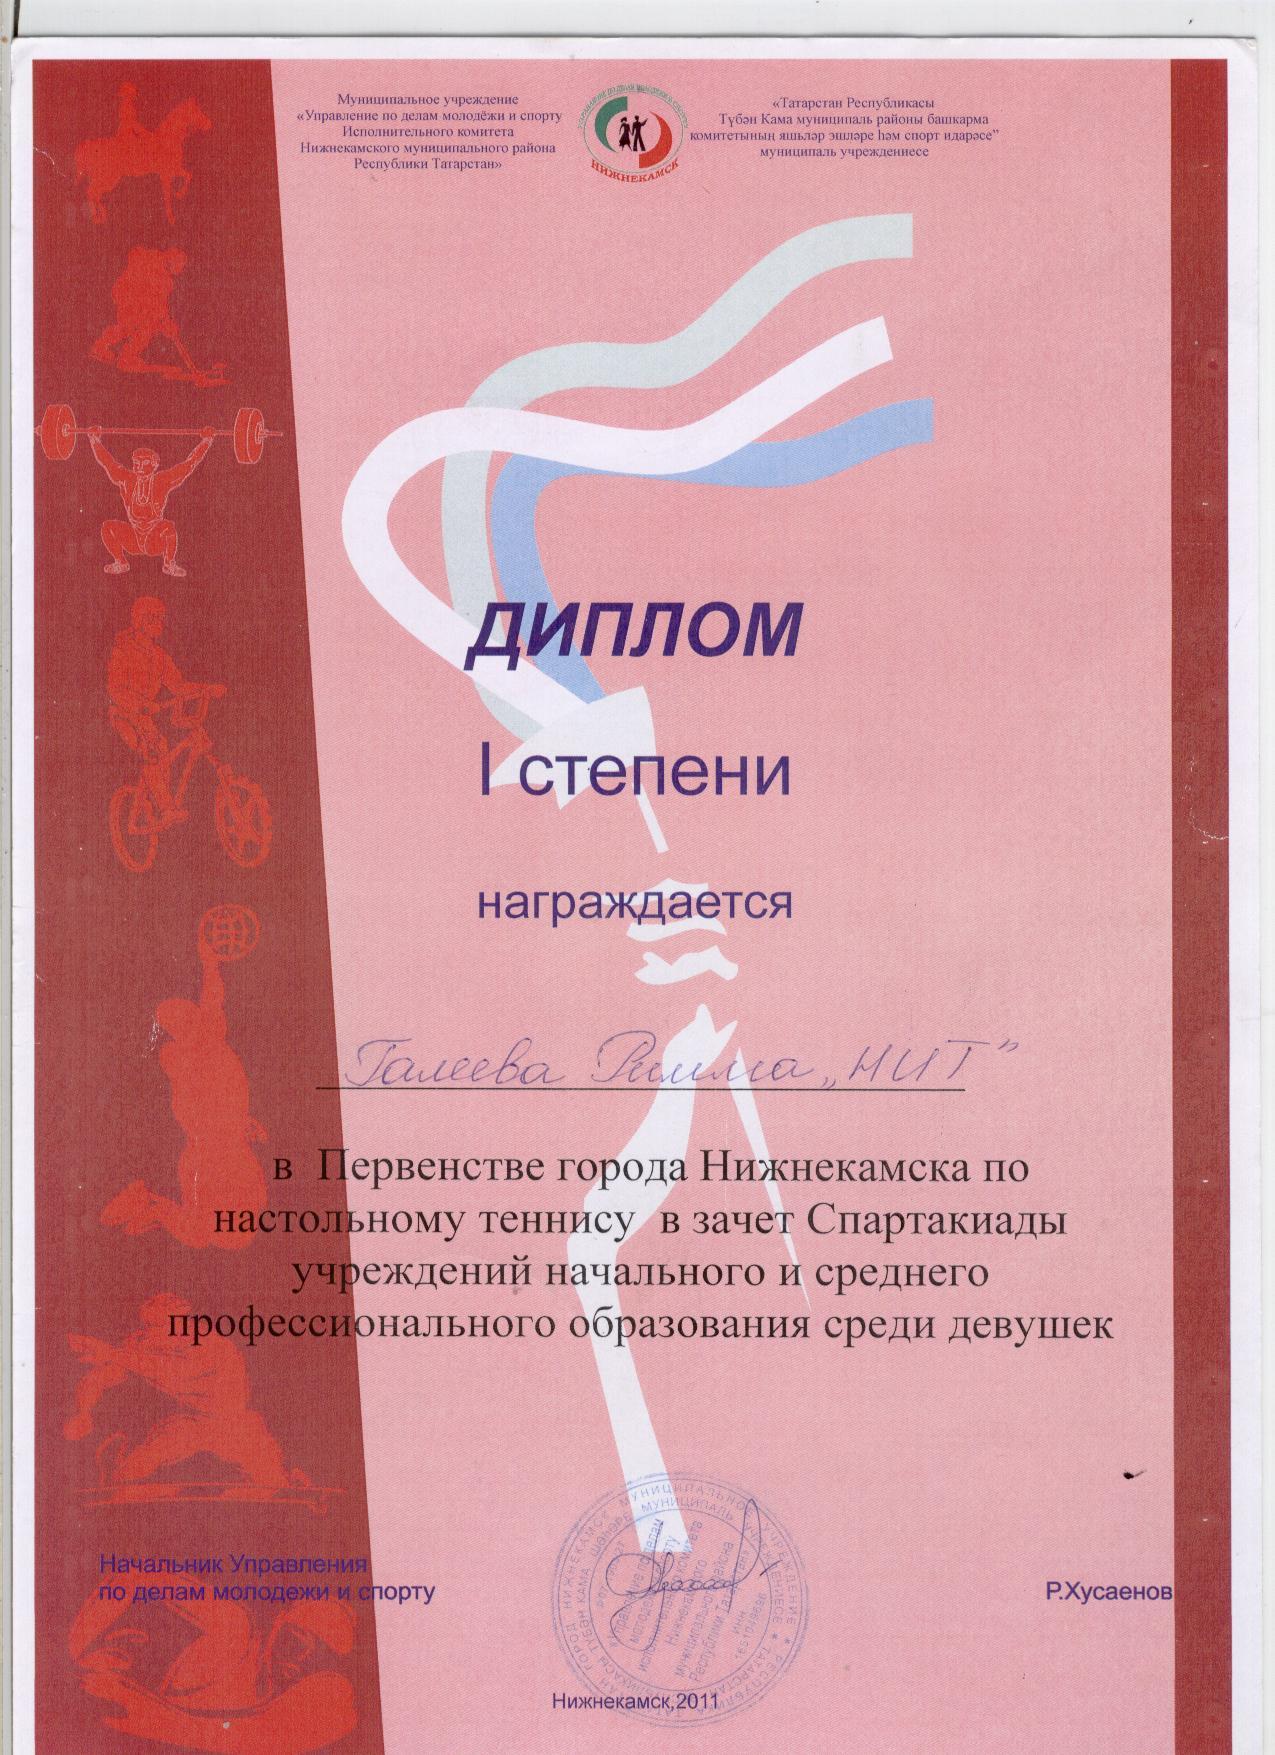 F:\Всероссйский конкурс Портфолио выпускника\РИММА\Римма 024.jpg